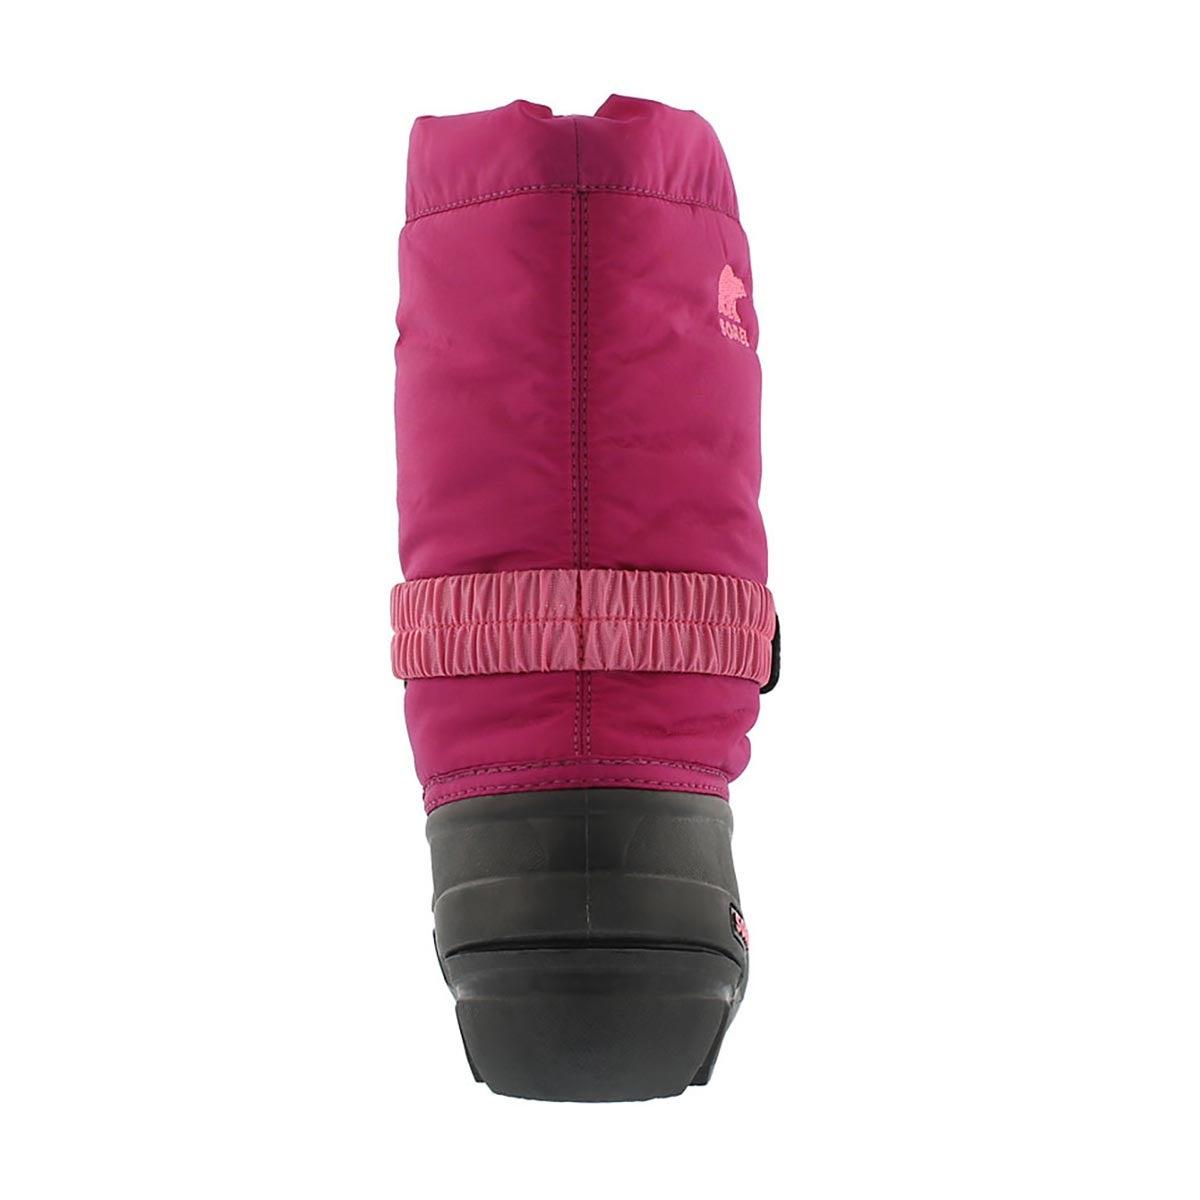 Botte d'hiver Flurry, rosé/rose, filles